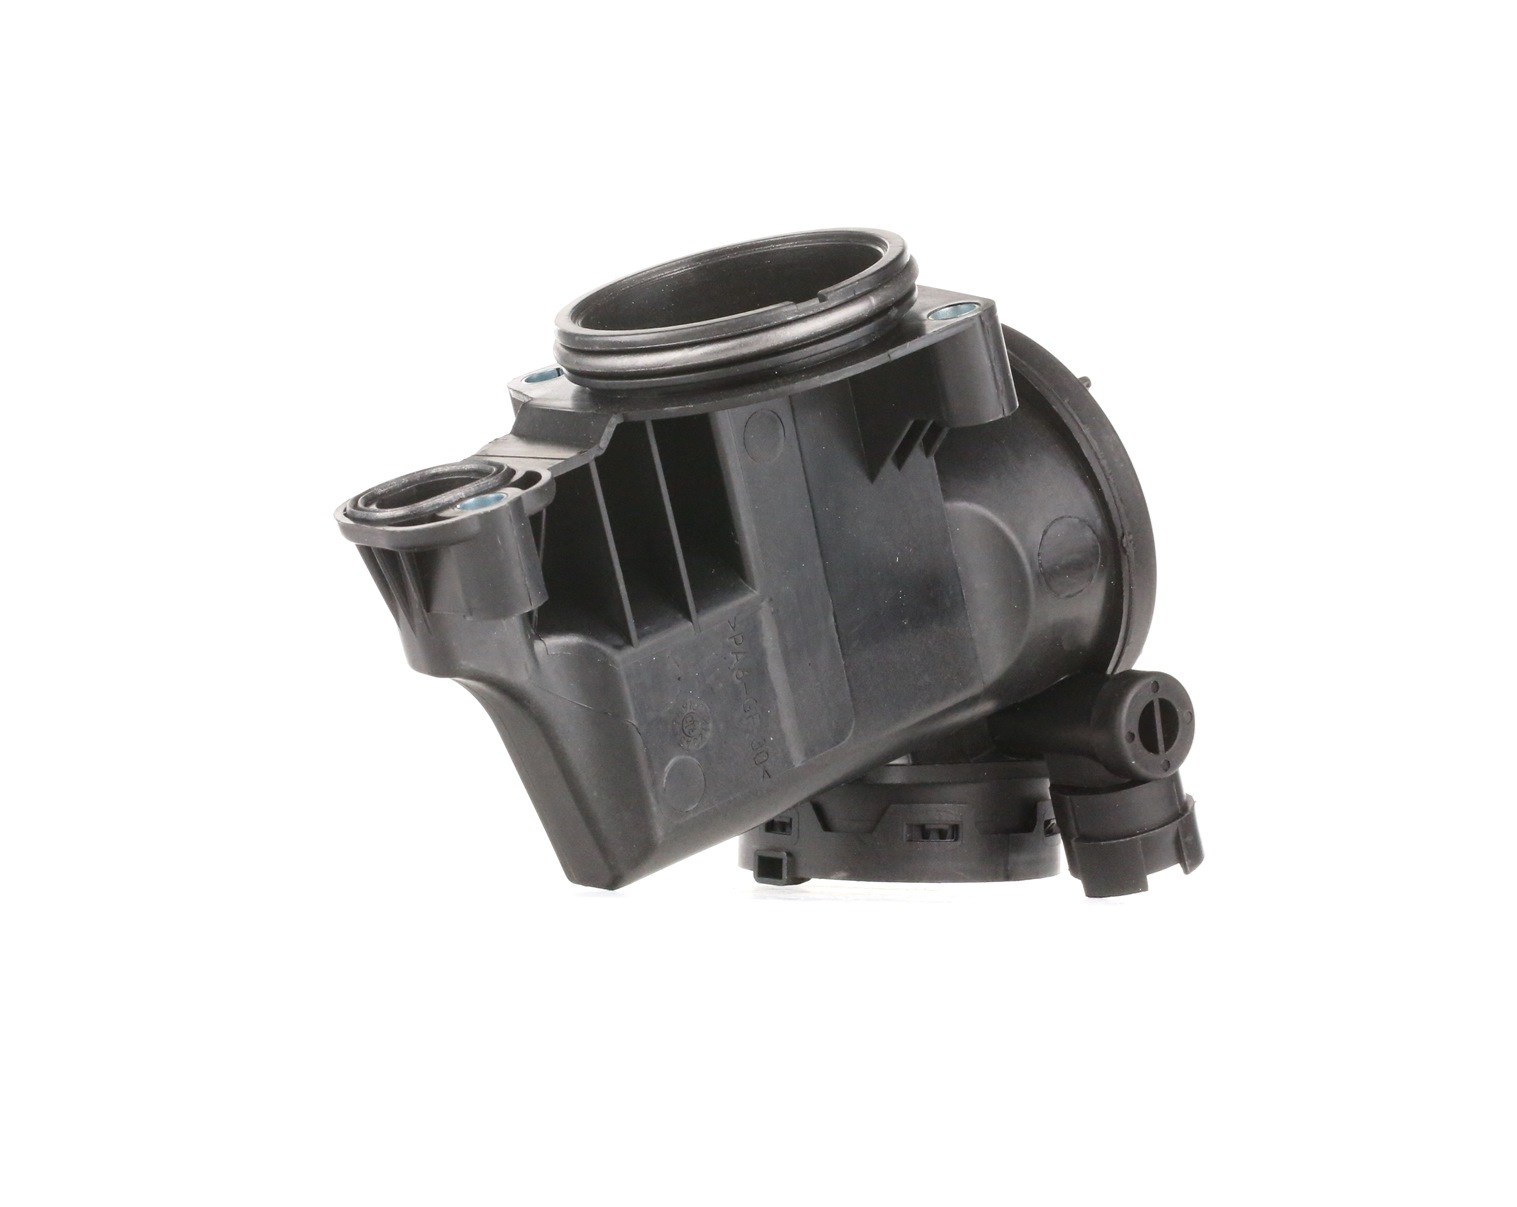 Ölabscheider Kurbelgehäuseentlüftung RIDEX 3886V0019